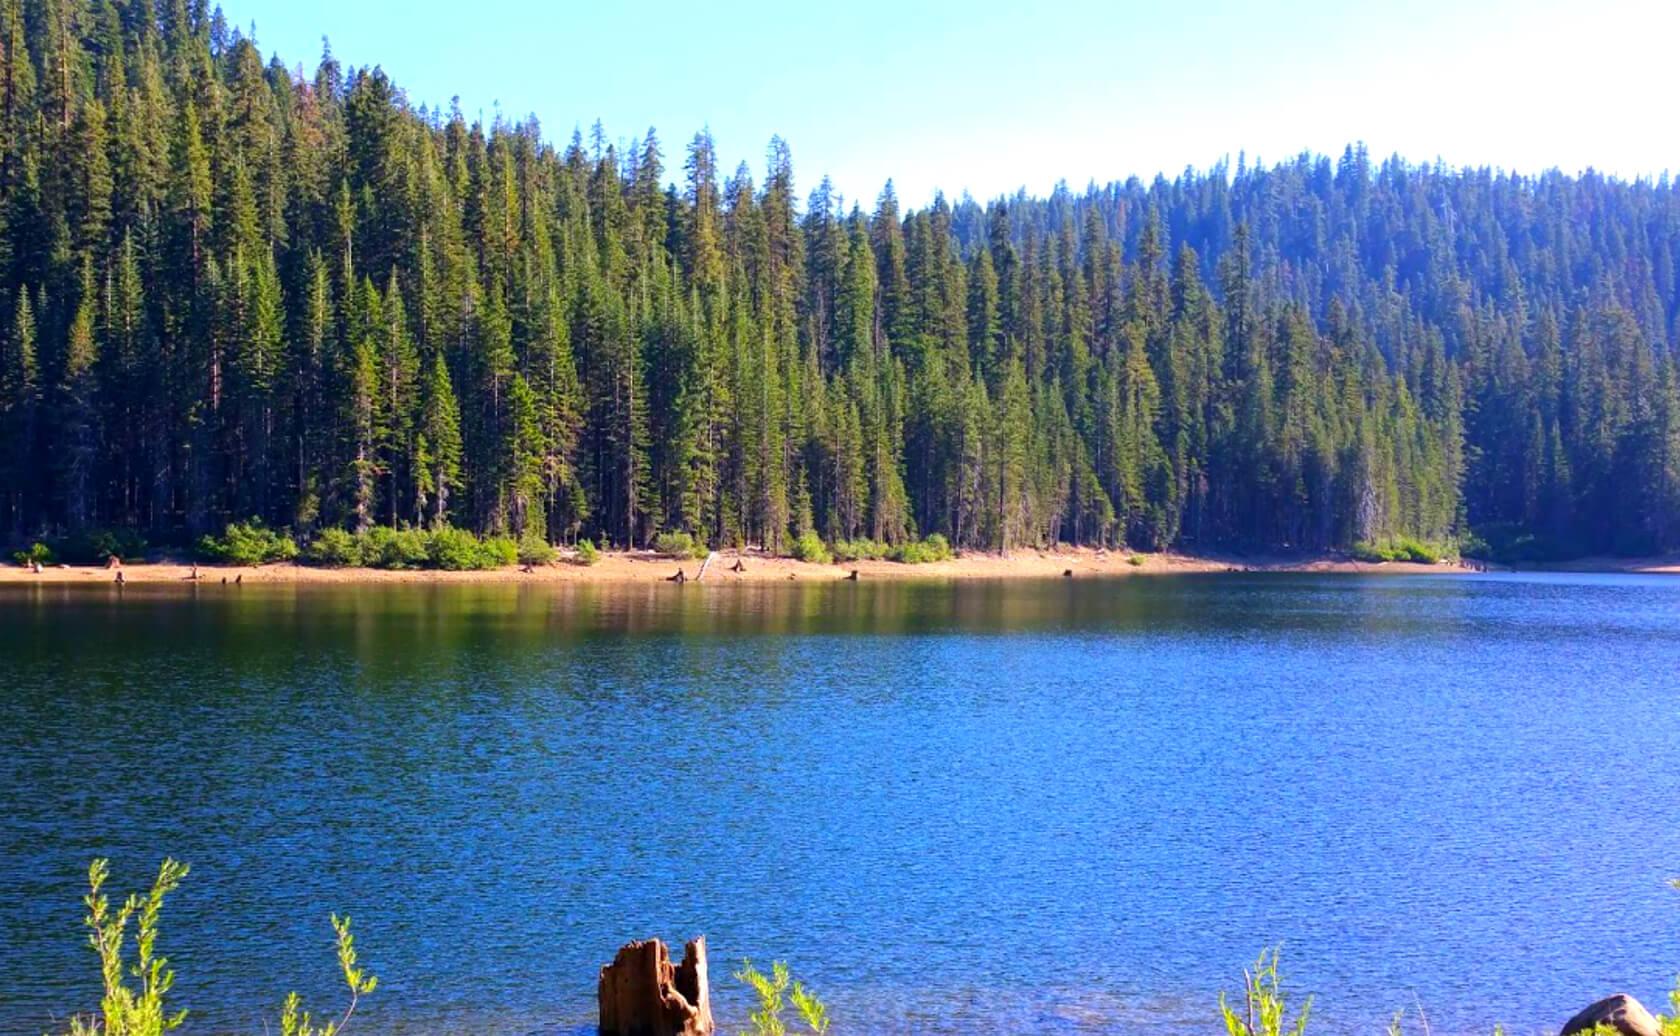 Bucks-Lake-Fishing-Guide-Report-California-03